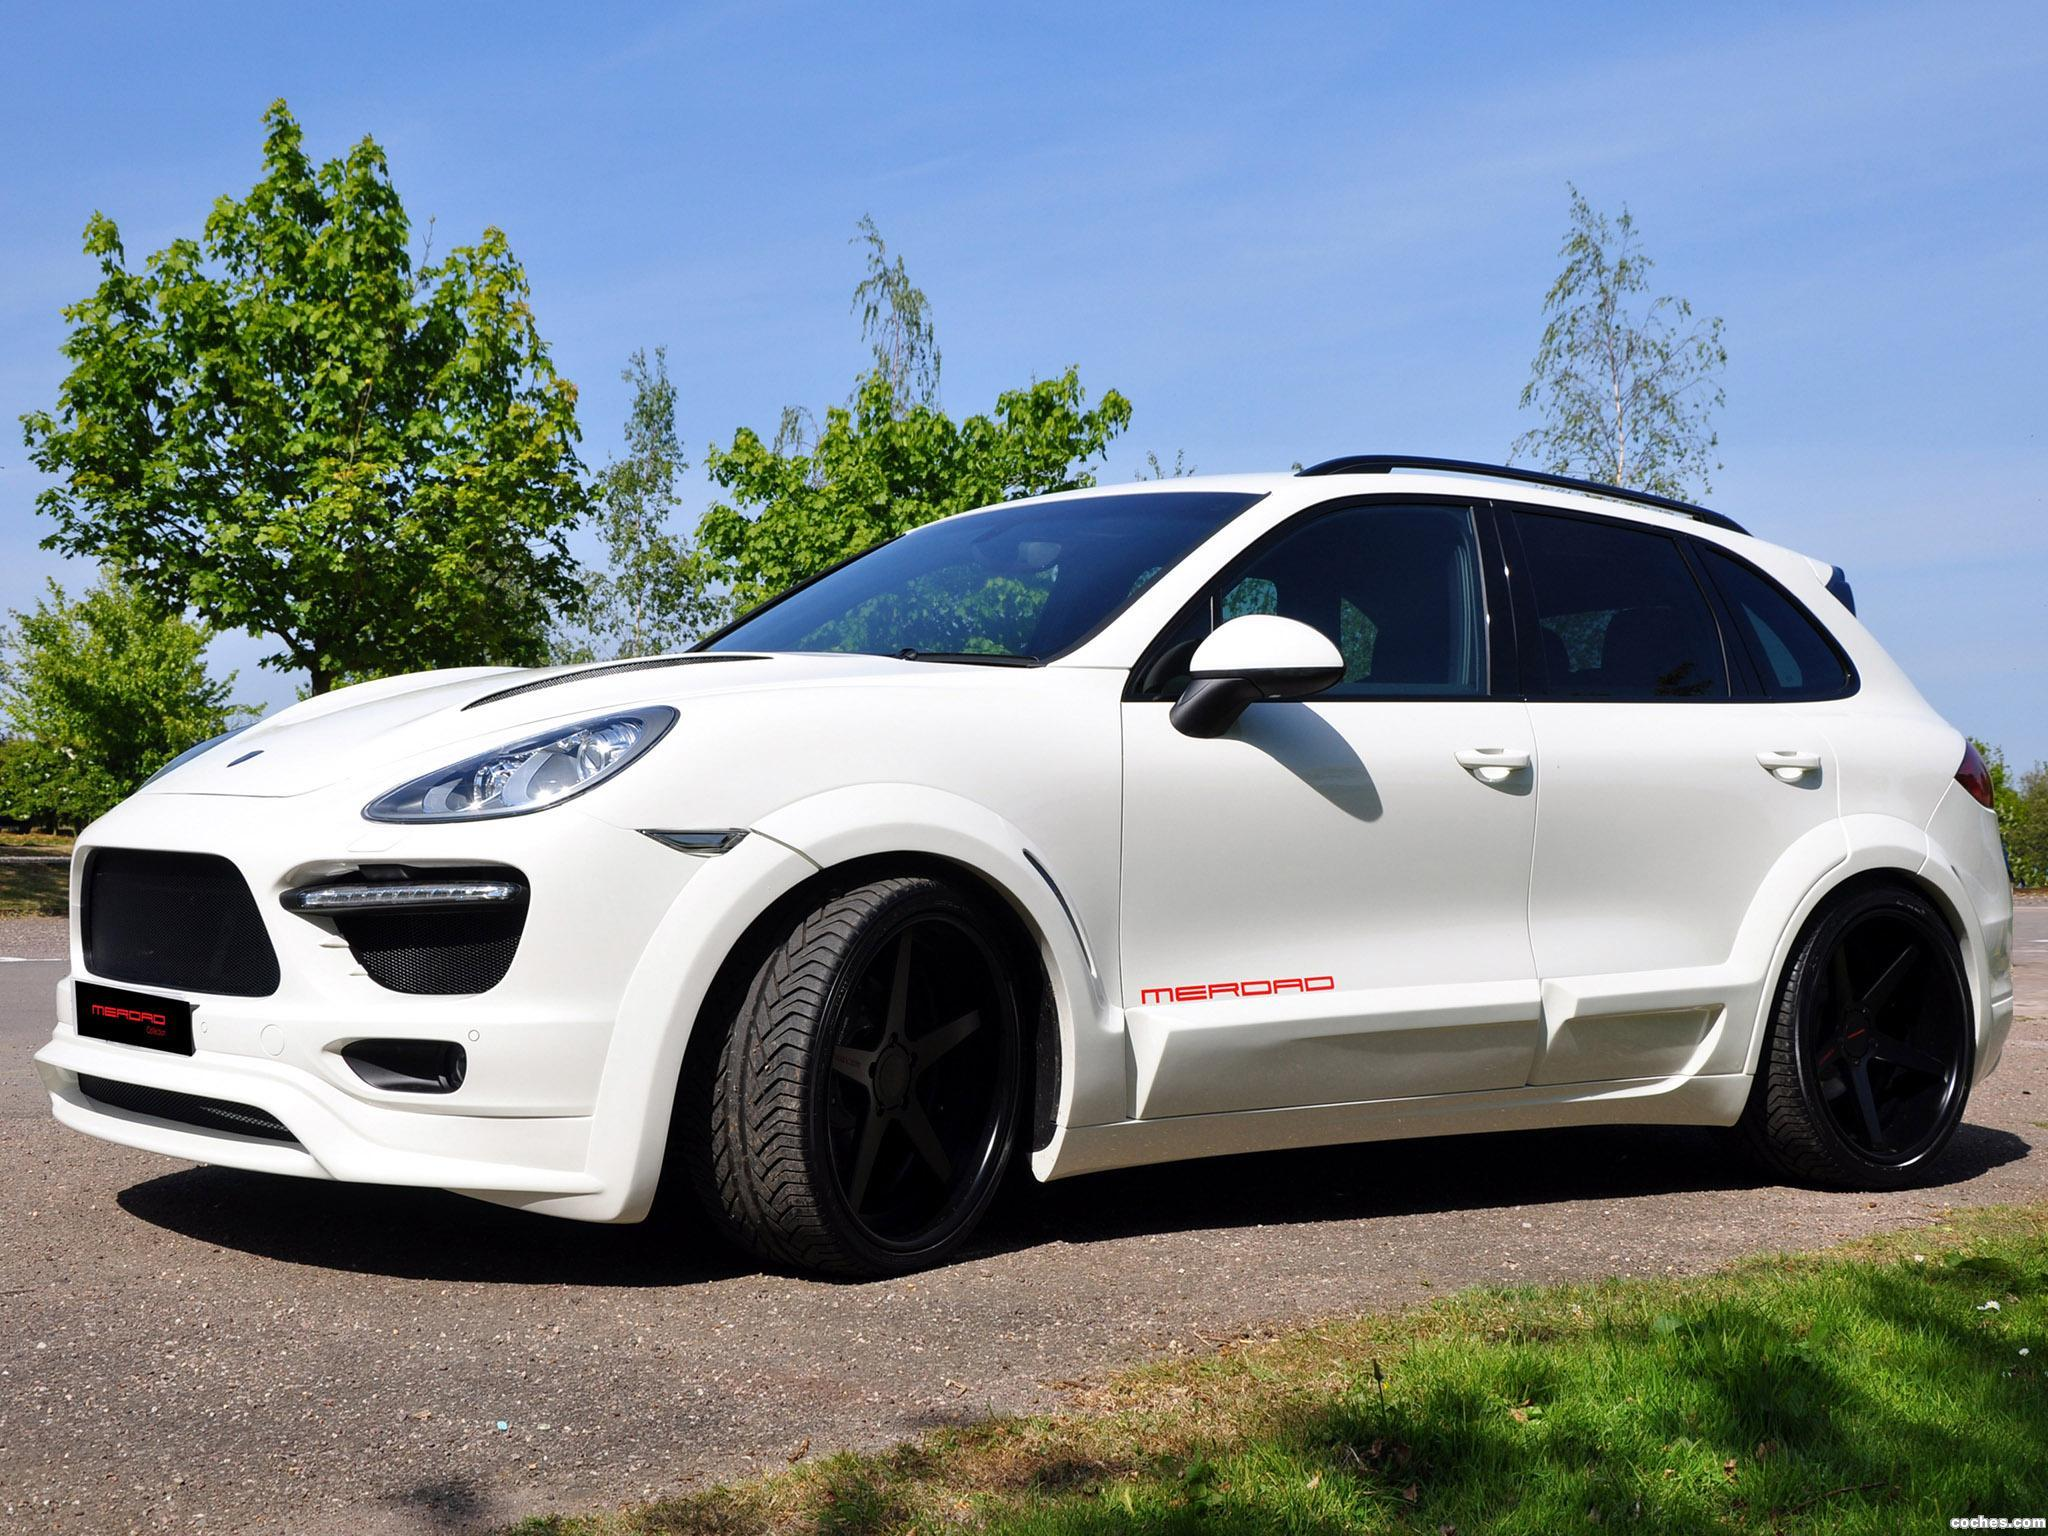 Foto 0 de Merdad Porsche Cayenne 958 2011